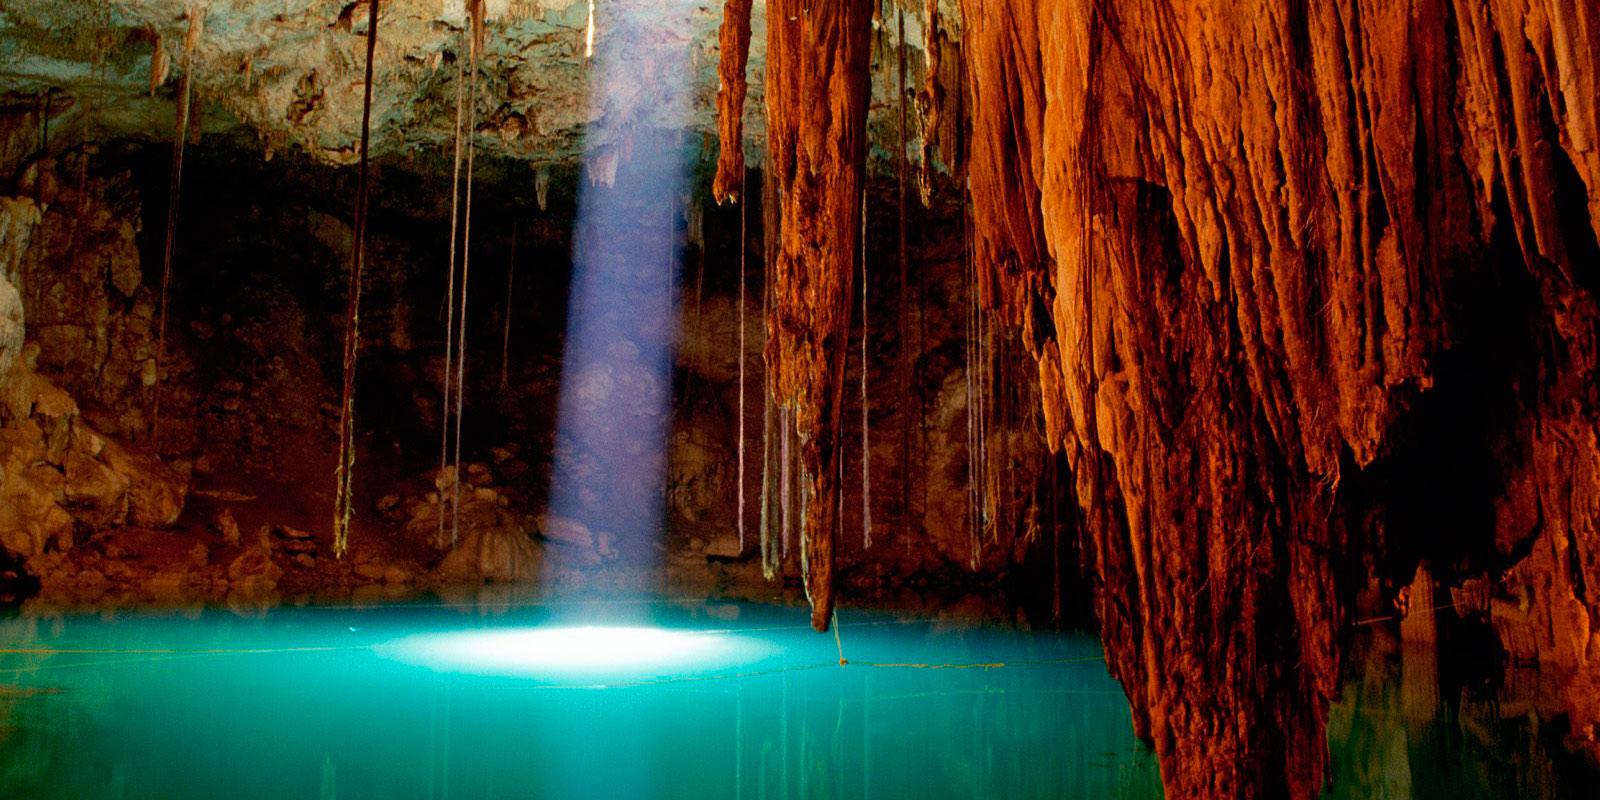 Why Chichen Itzá it´s a wonder of the world 01